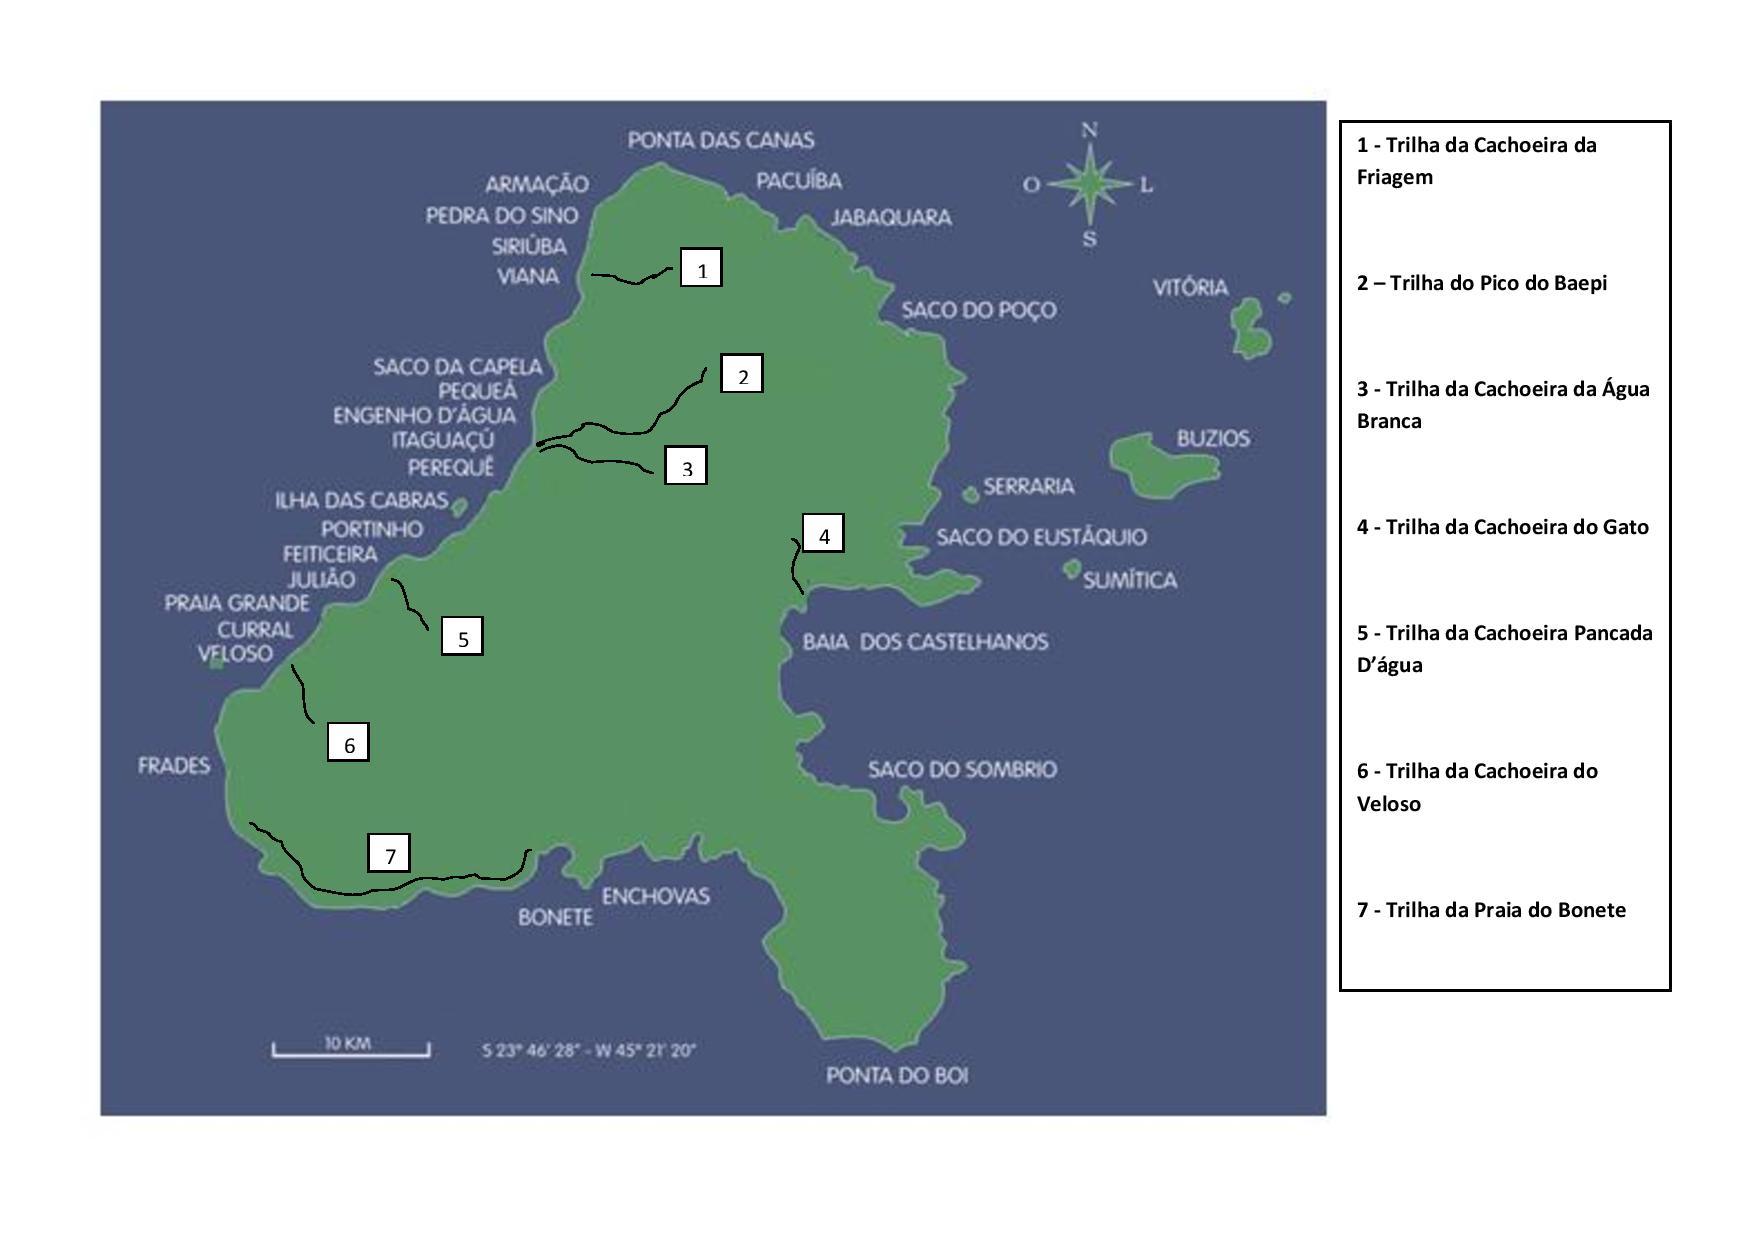 monitores-ambientais-mapa-trilhas-oficiais-page-001